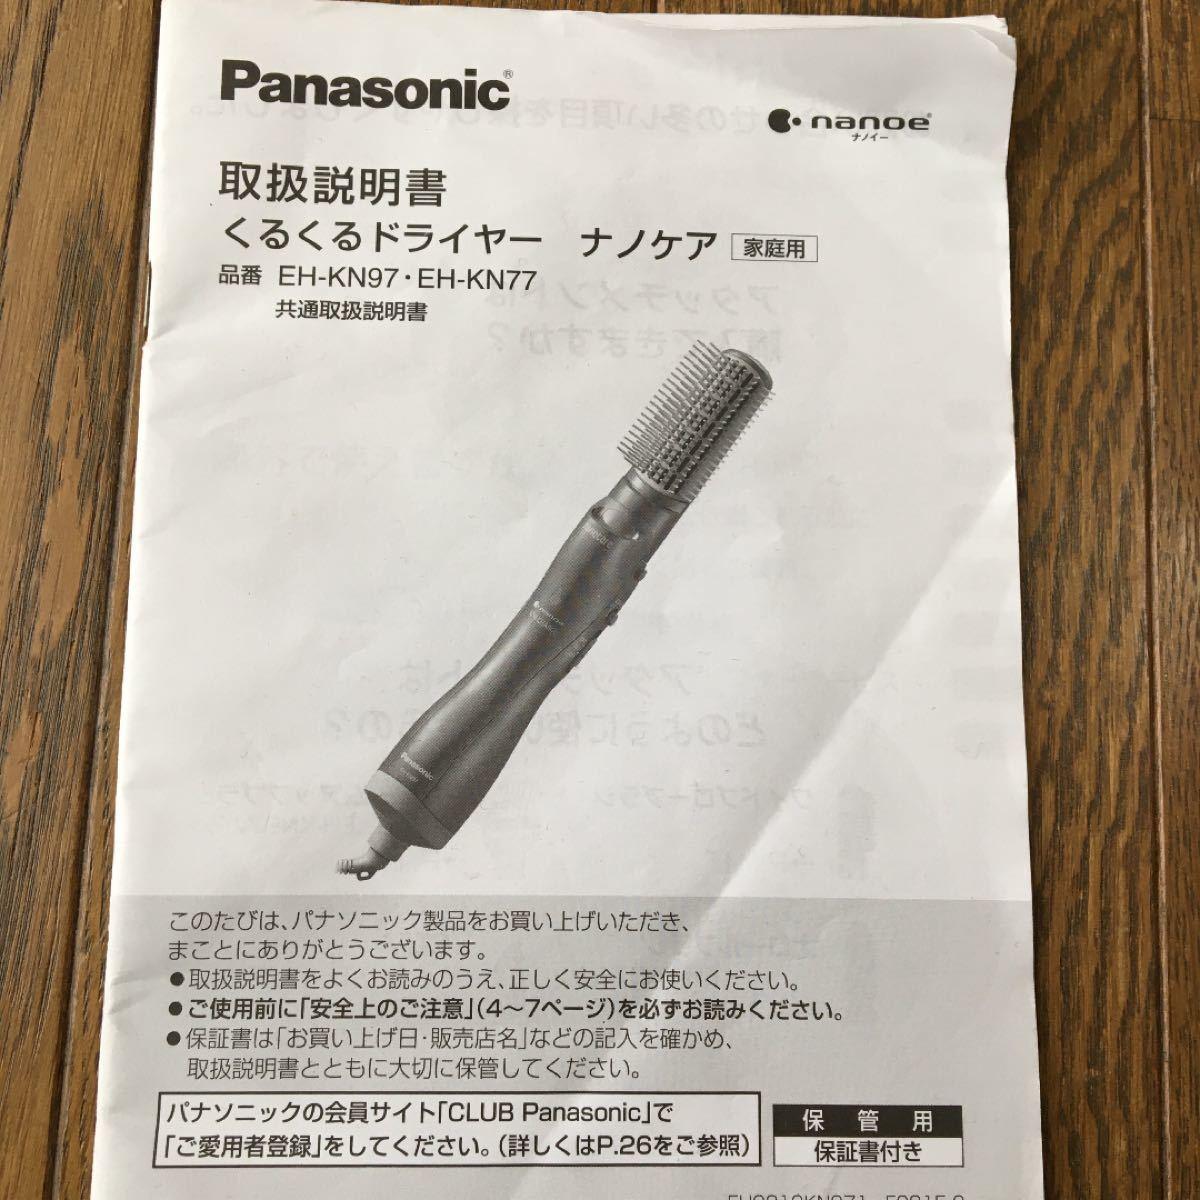 Panasonic くるくるドライヤー アタッチメント2点